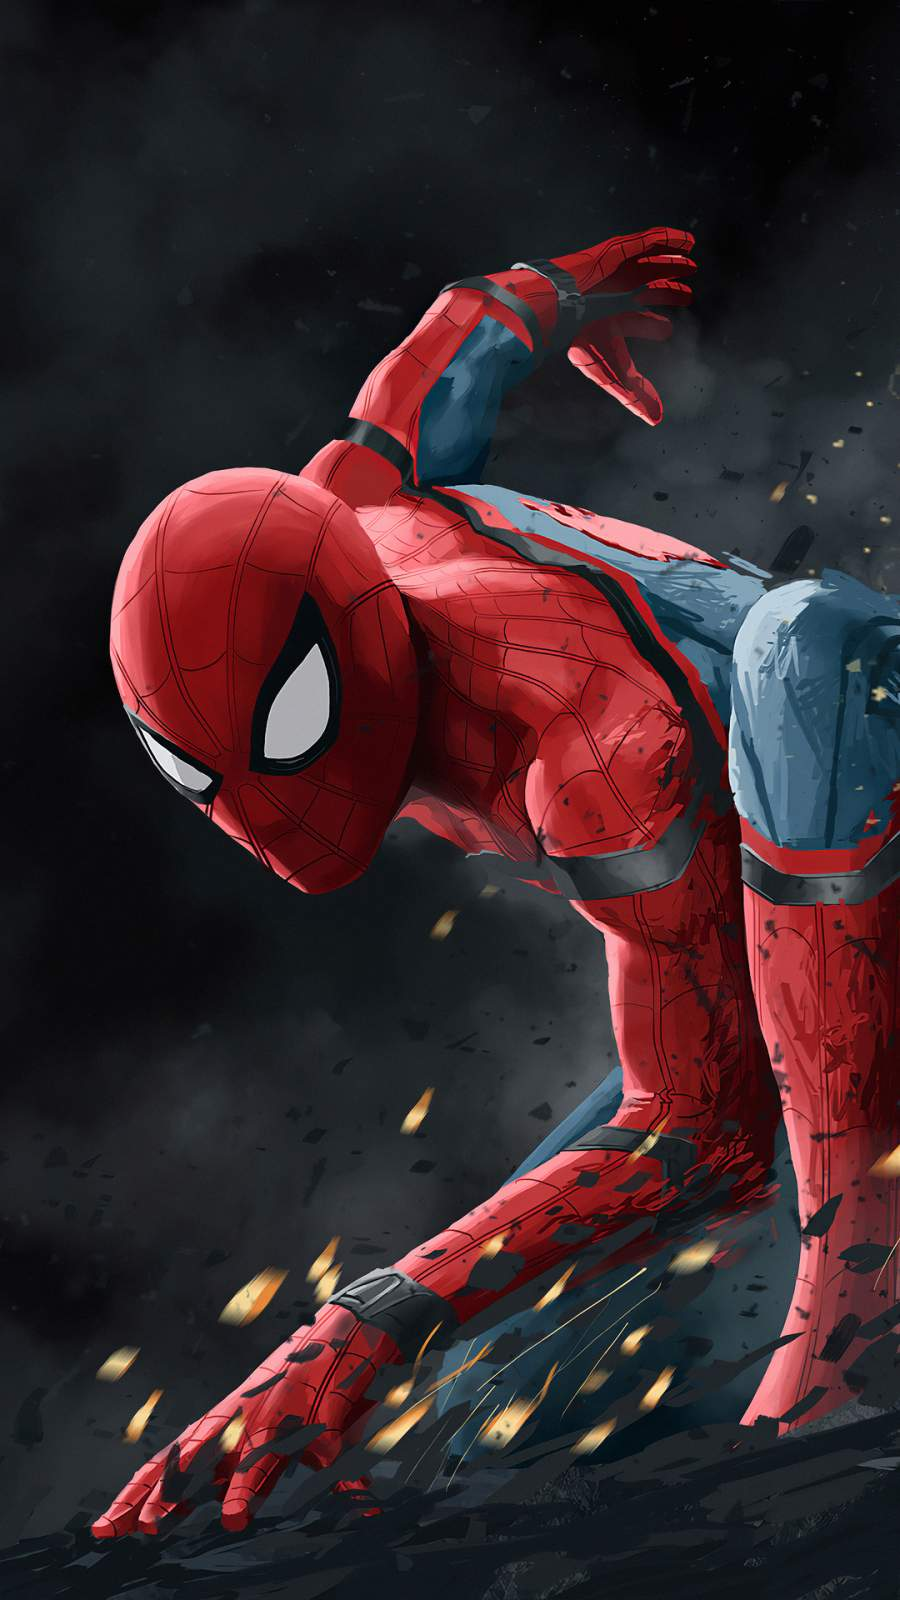 Spider Man Action Art iPhone Wallpaper